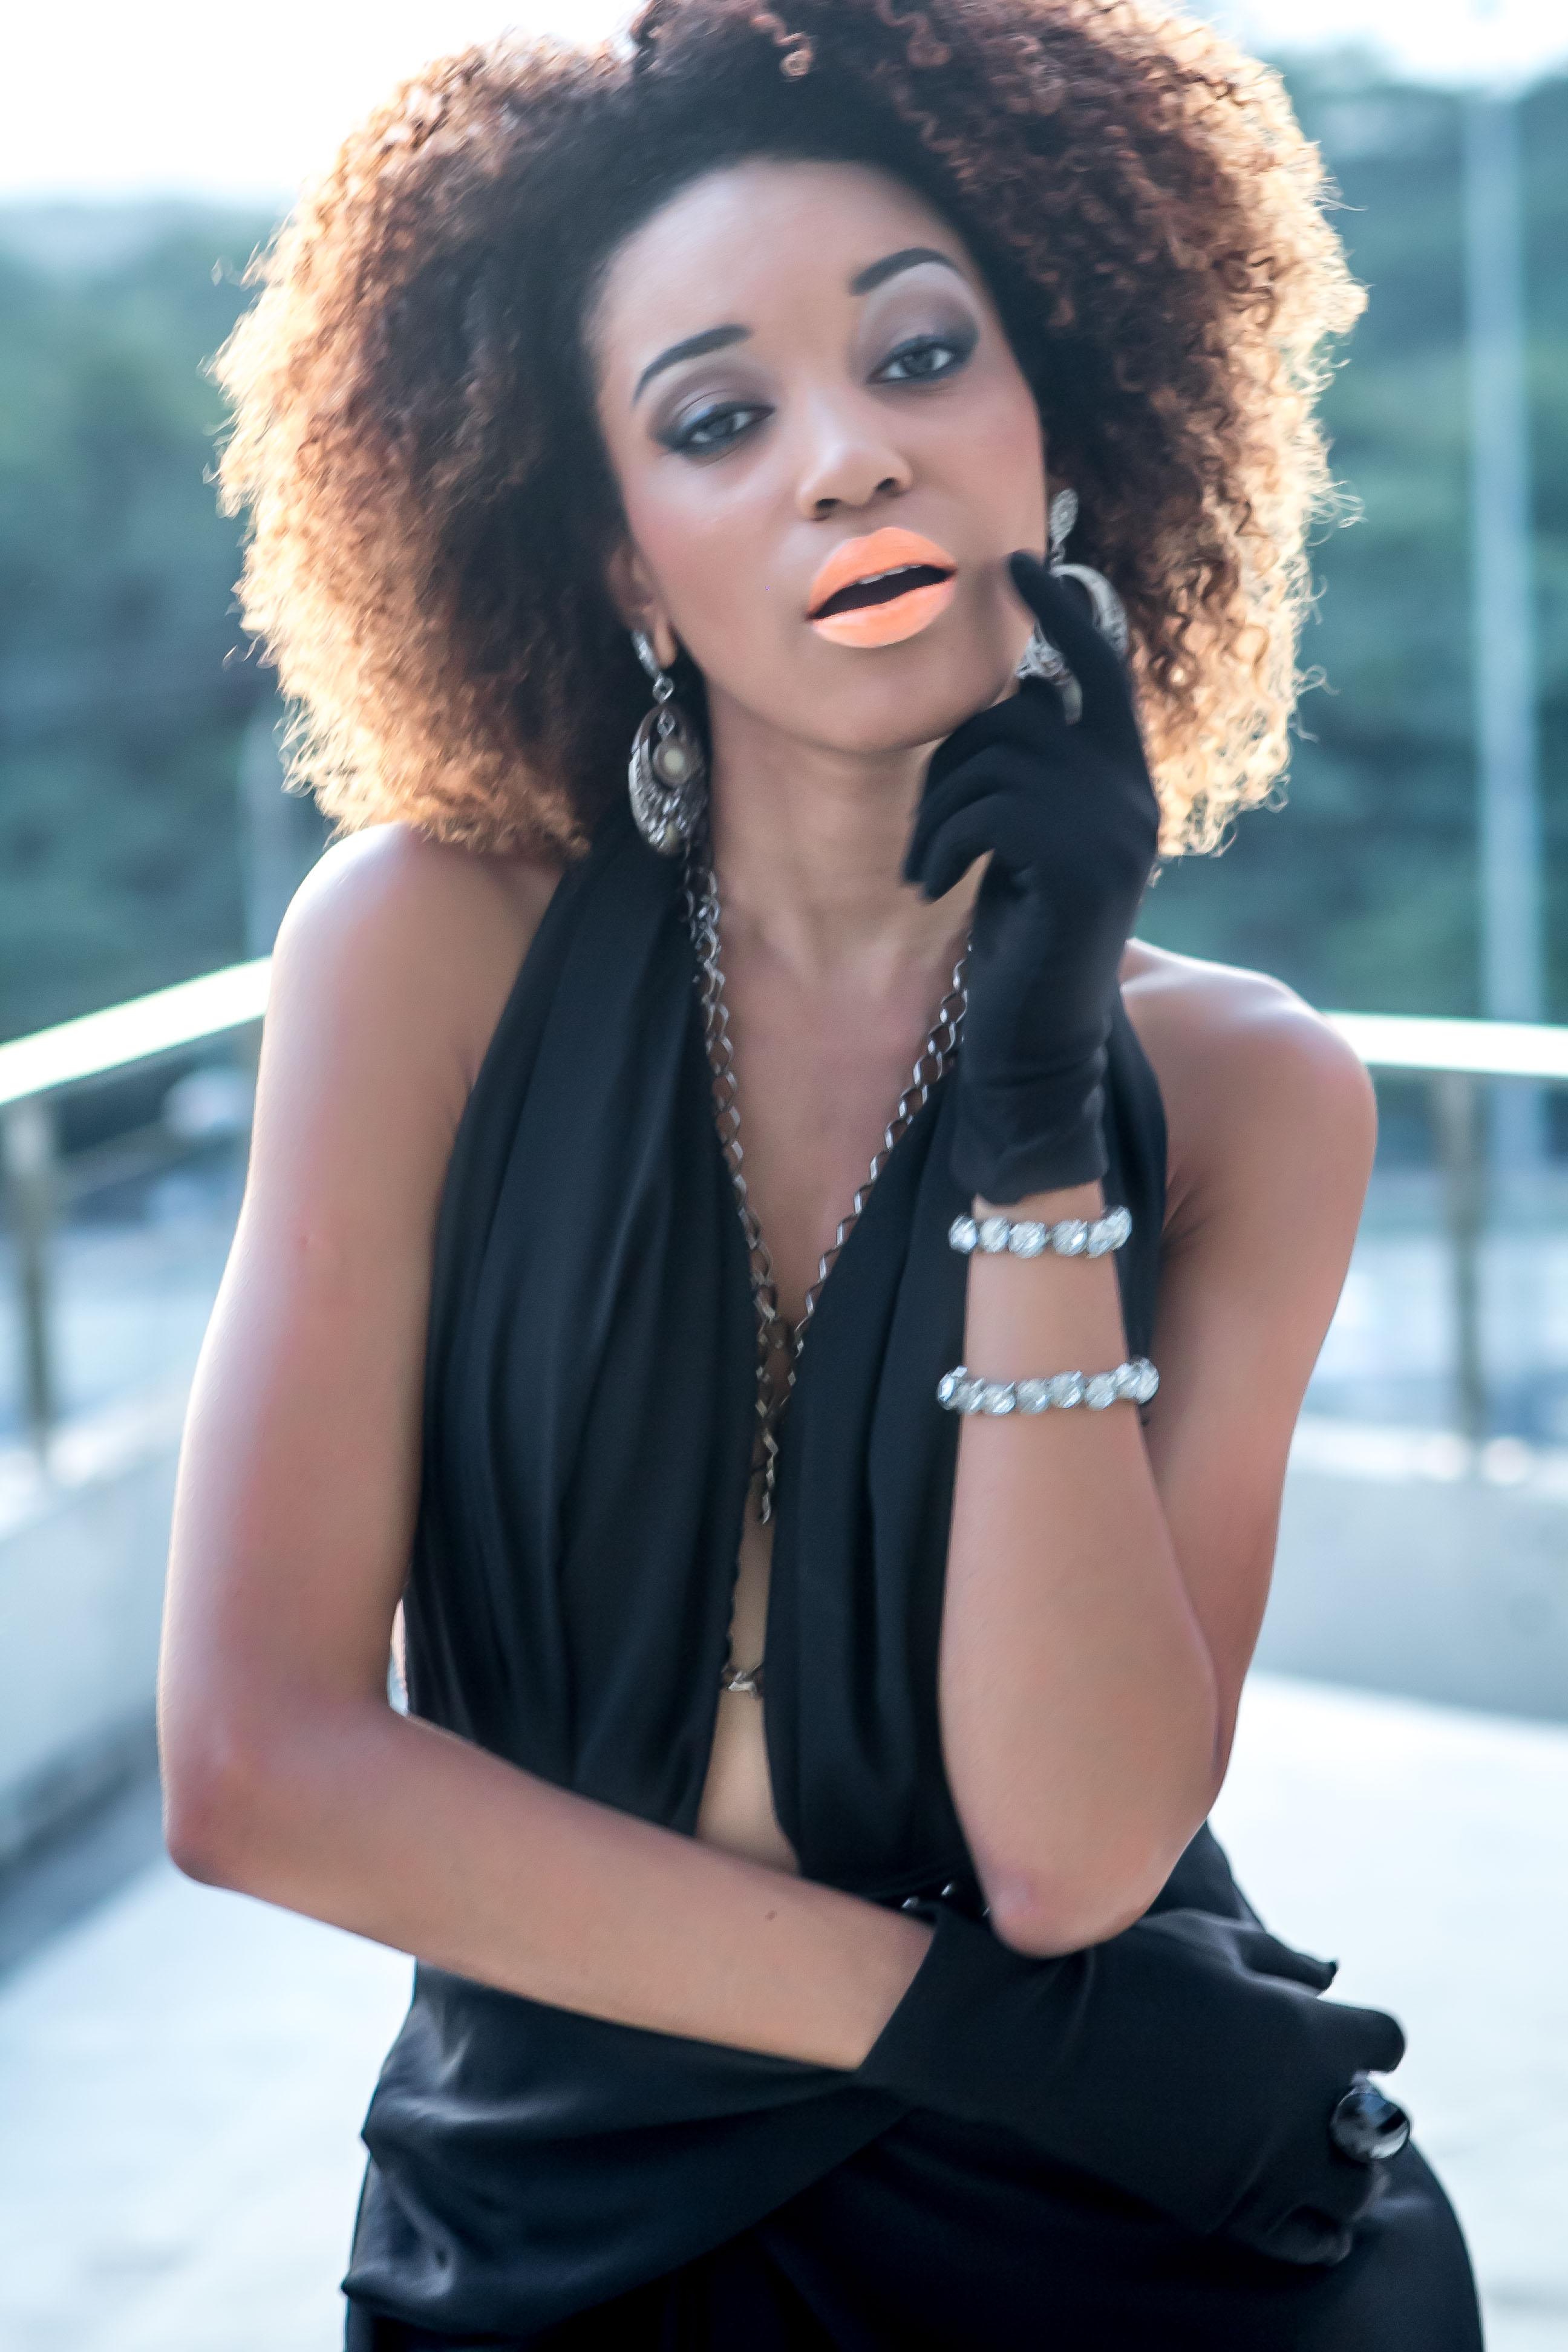 Faces of Afro Brazil 29: Actress Stefanie Durval | Black Women of Brazil